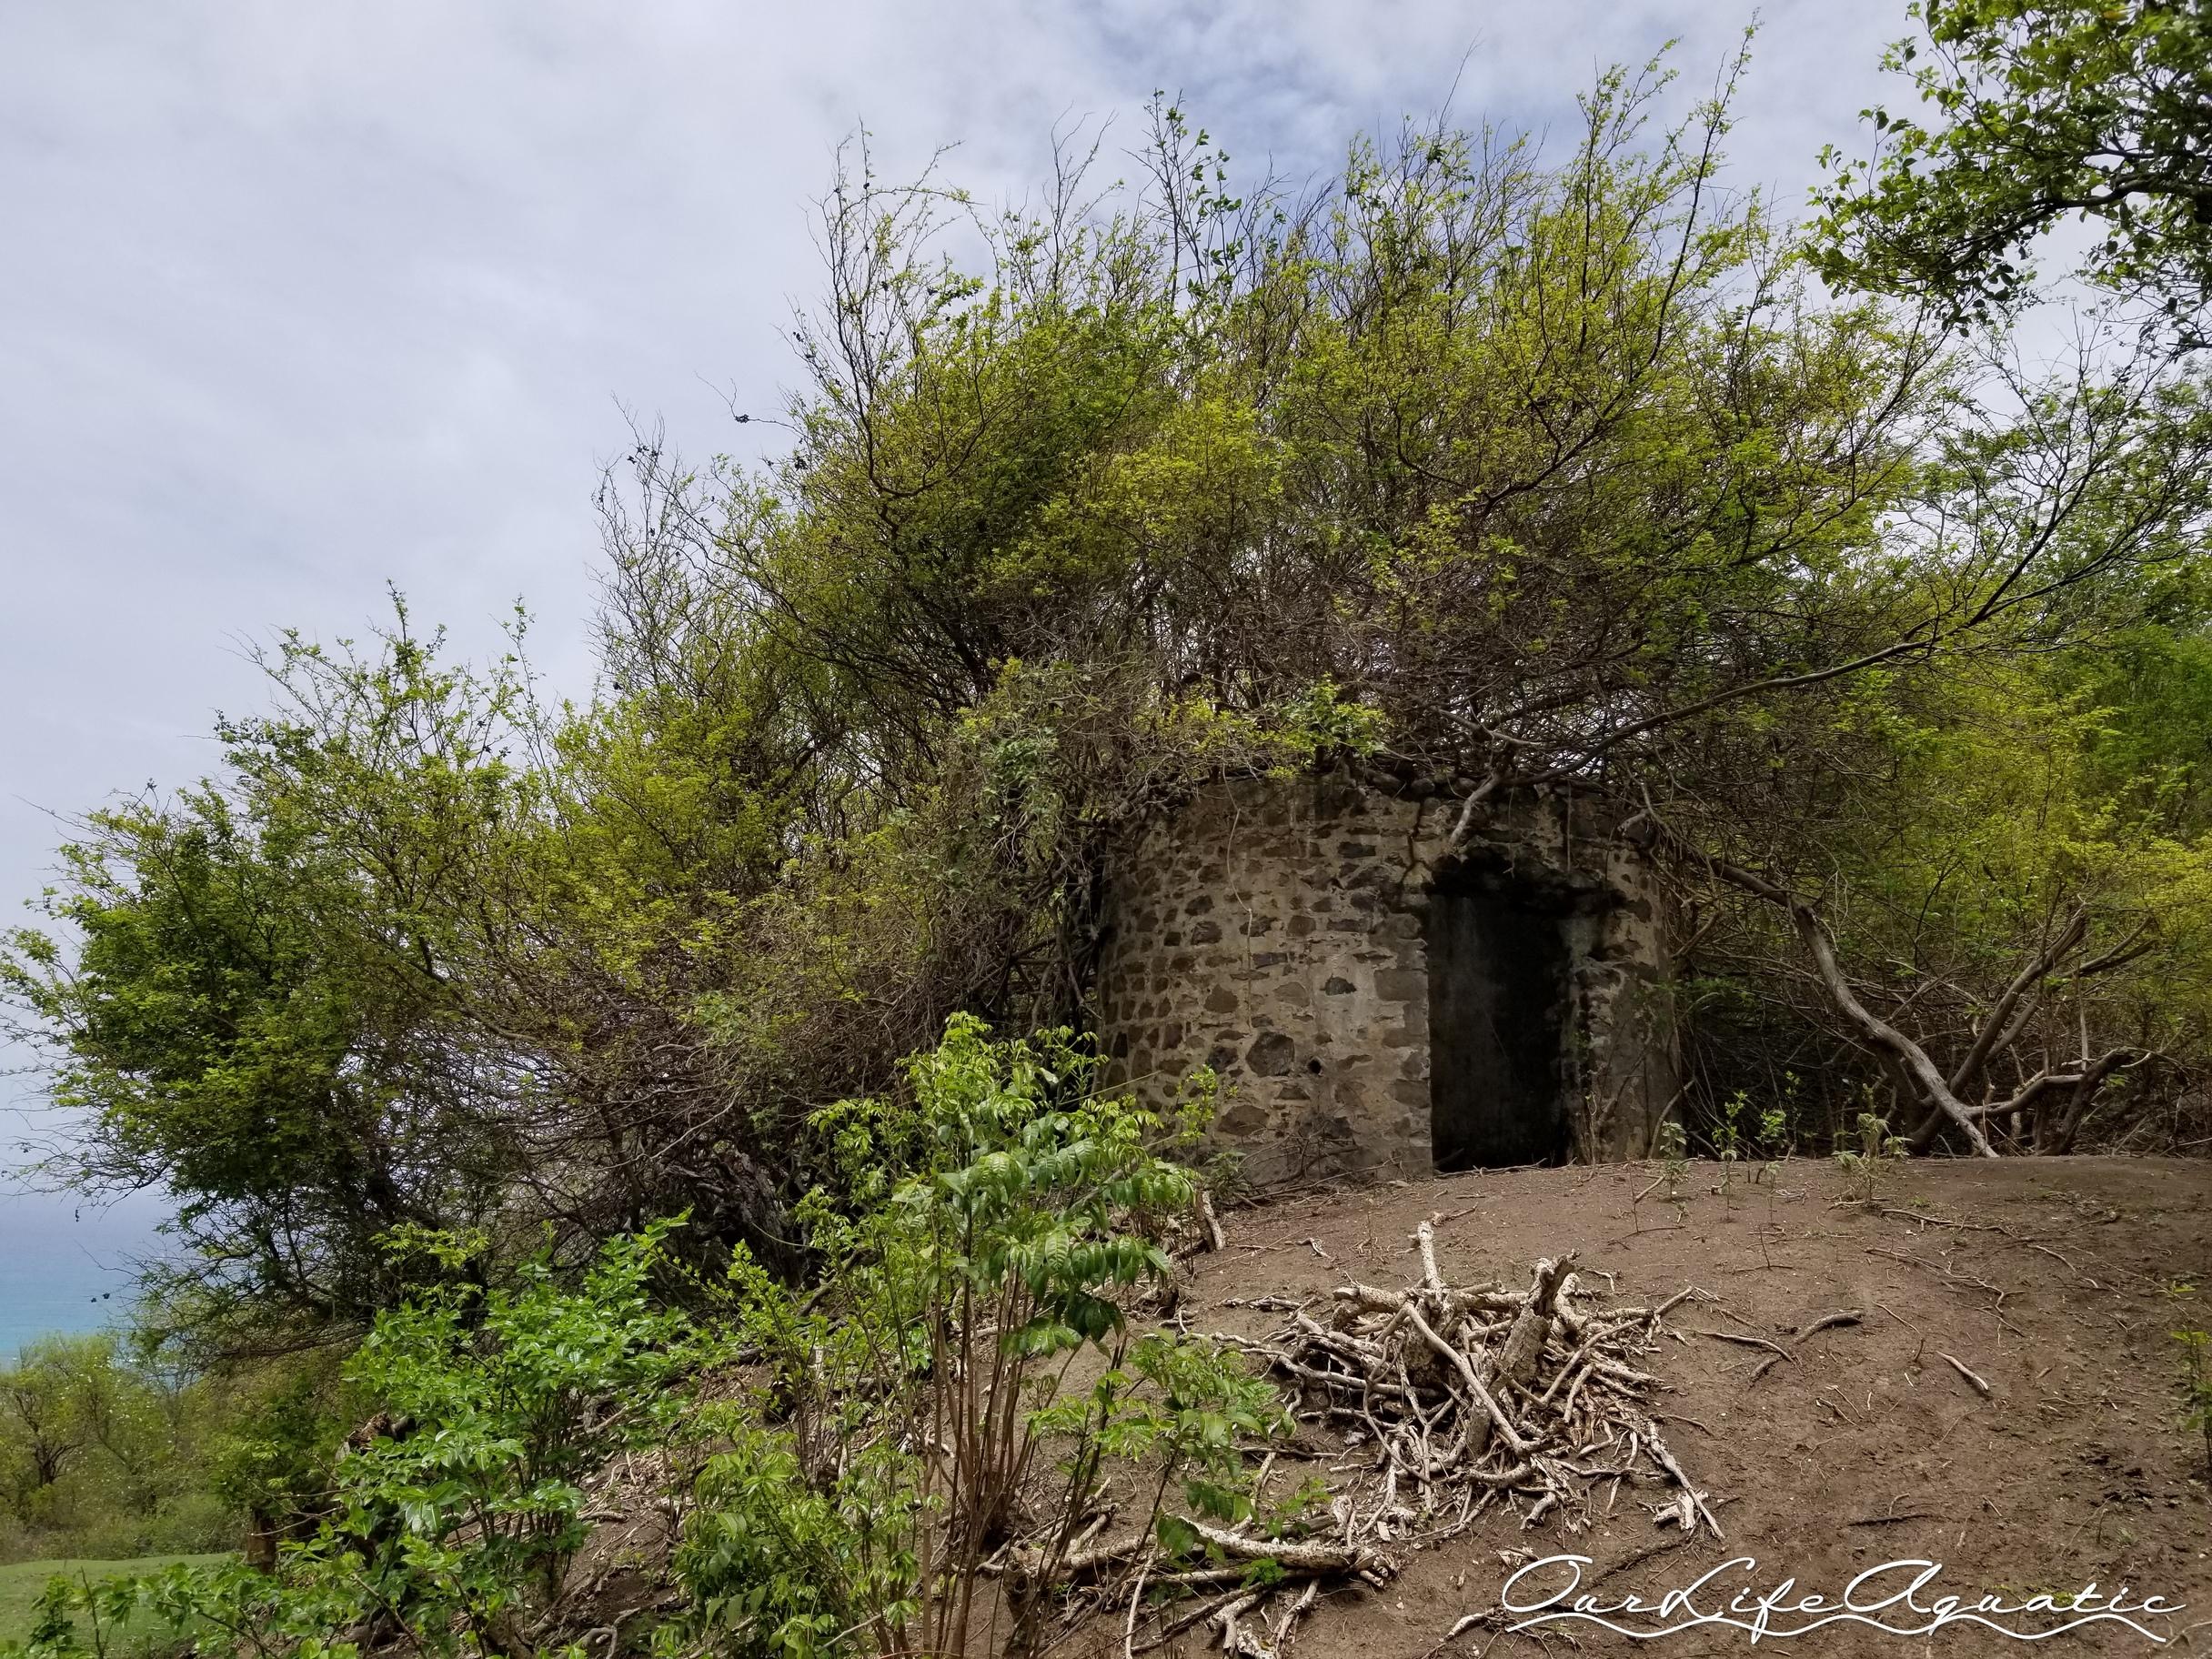 Hiking in Carriacou